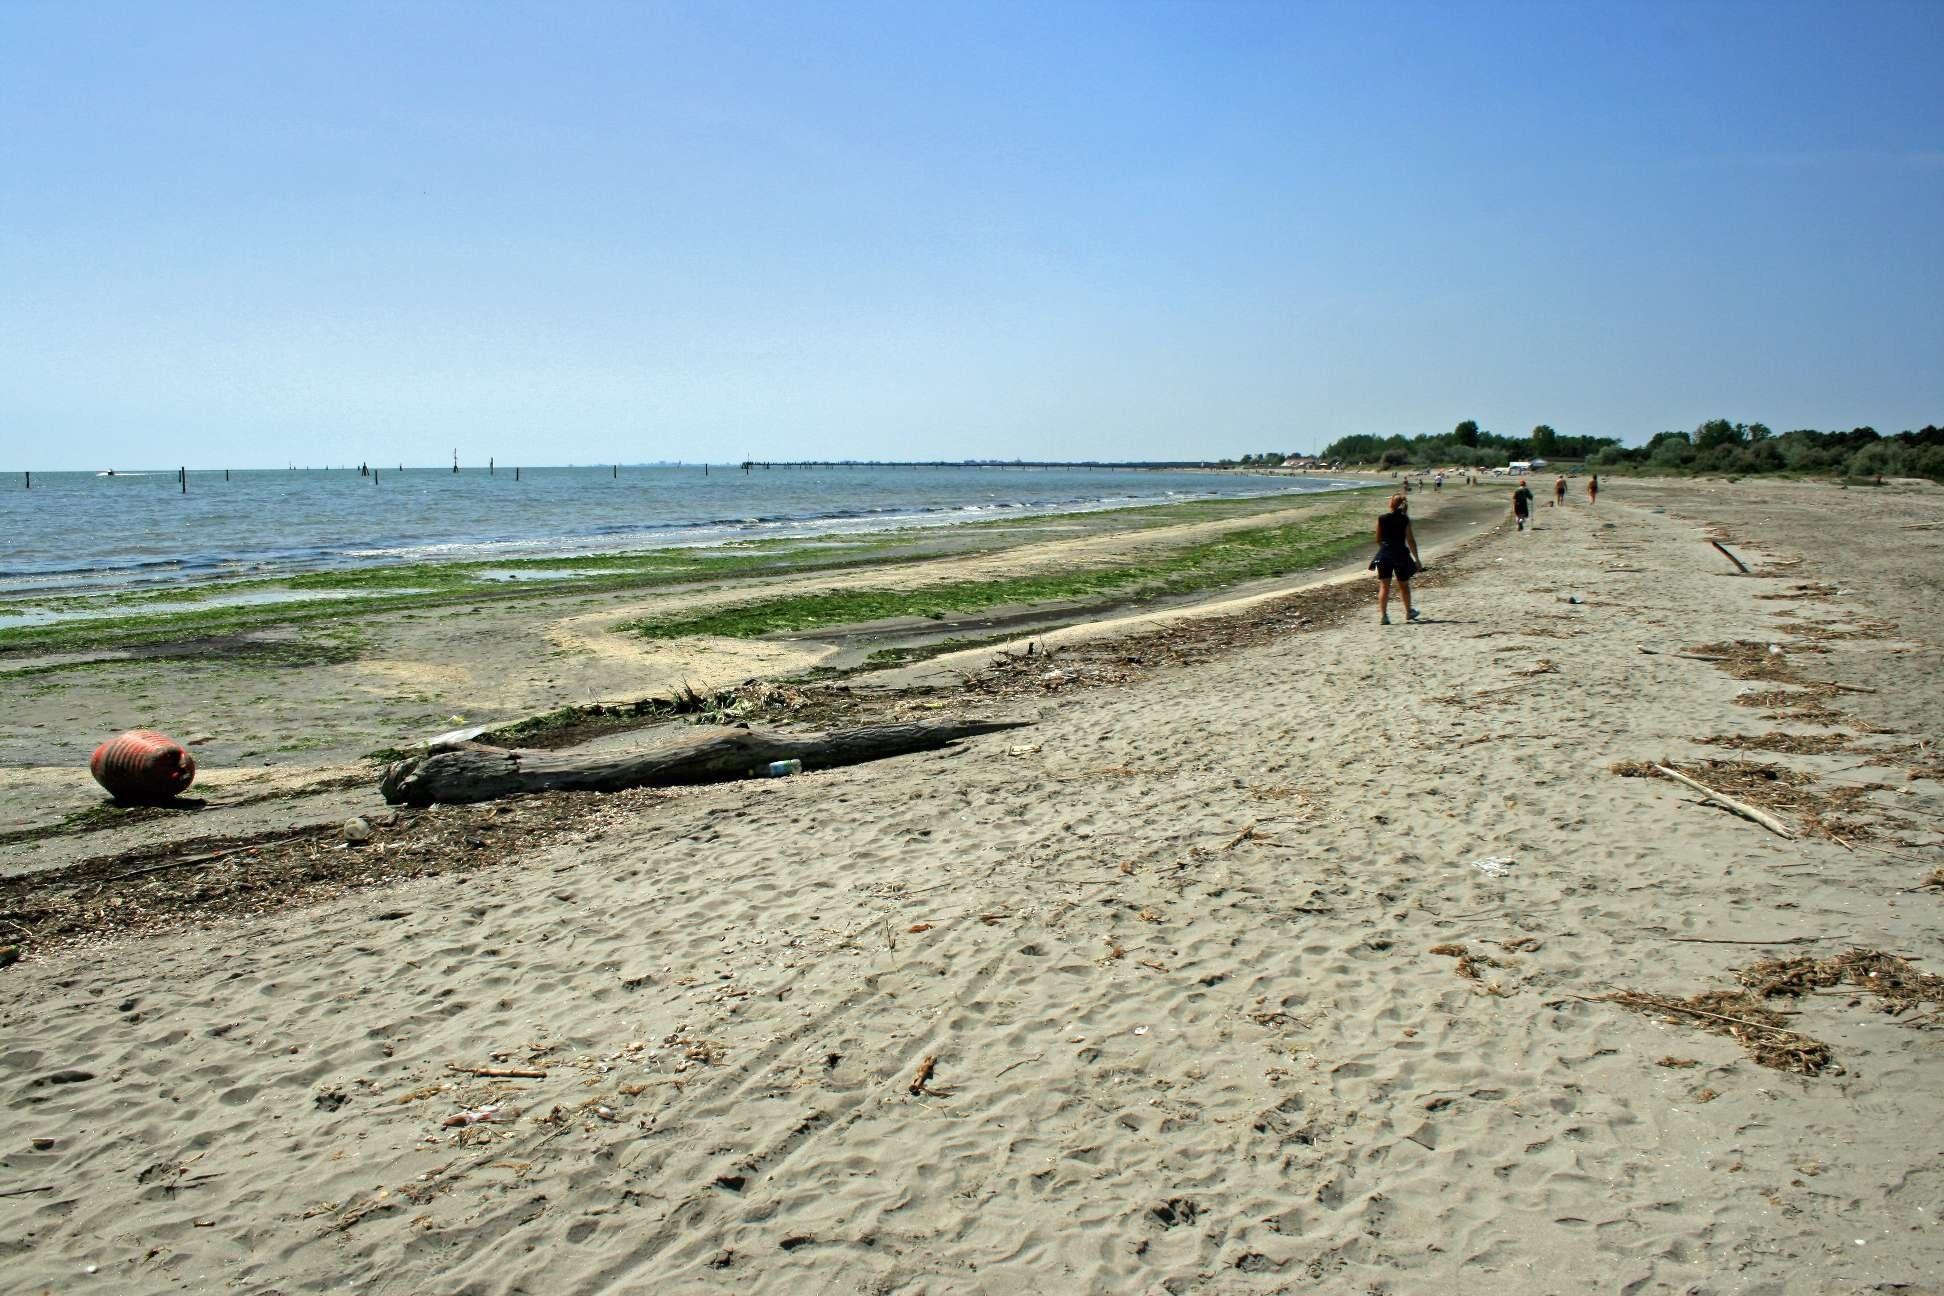 spiaggia libera, Comacchio, Emilia-Romagna, Italy